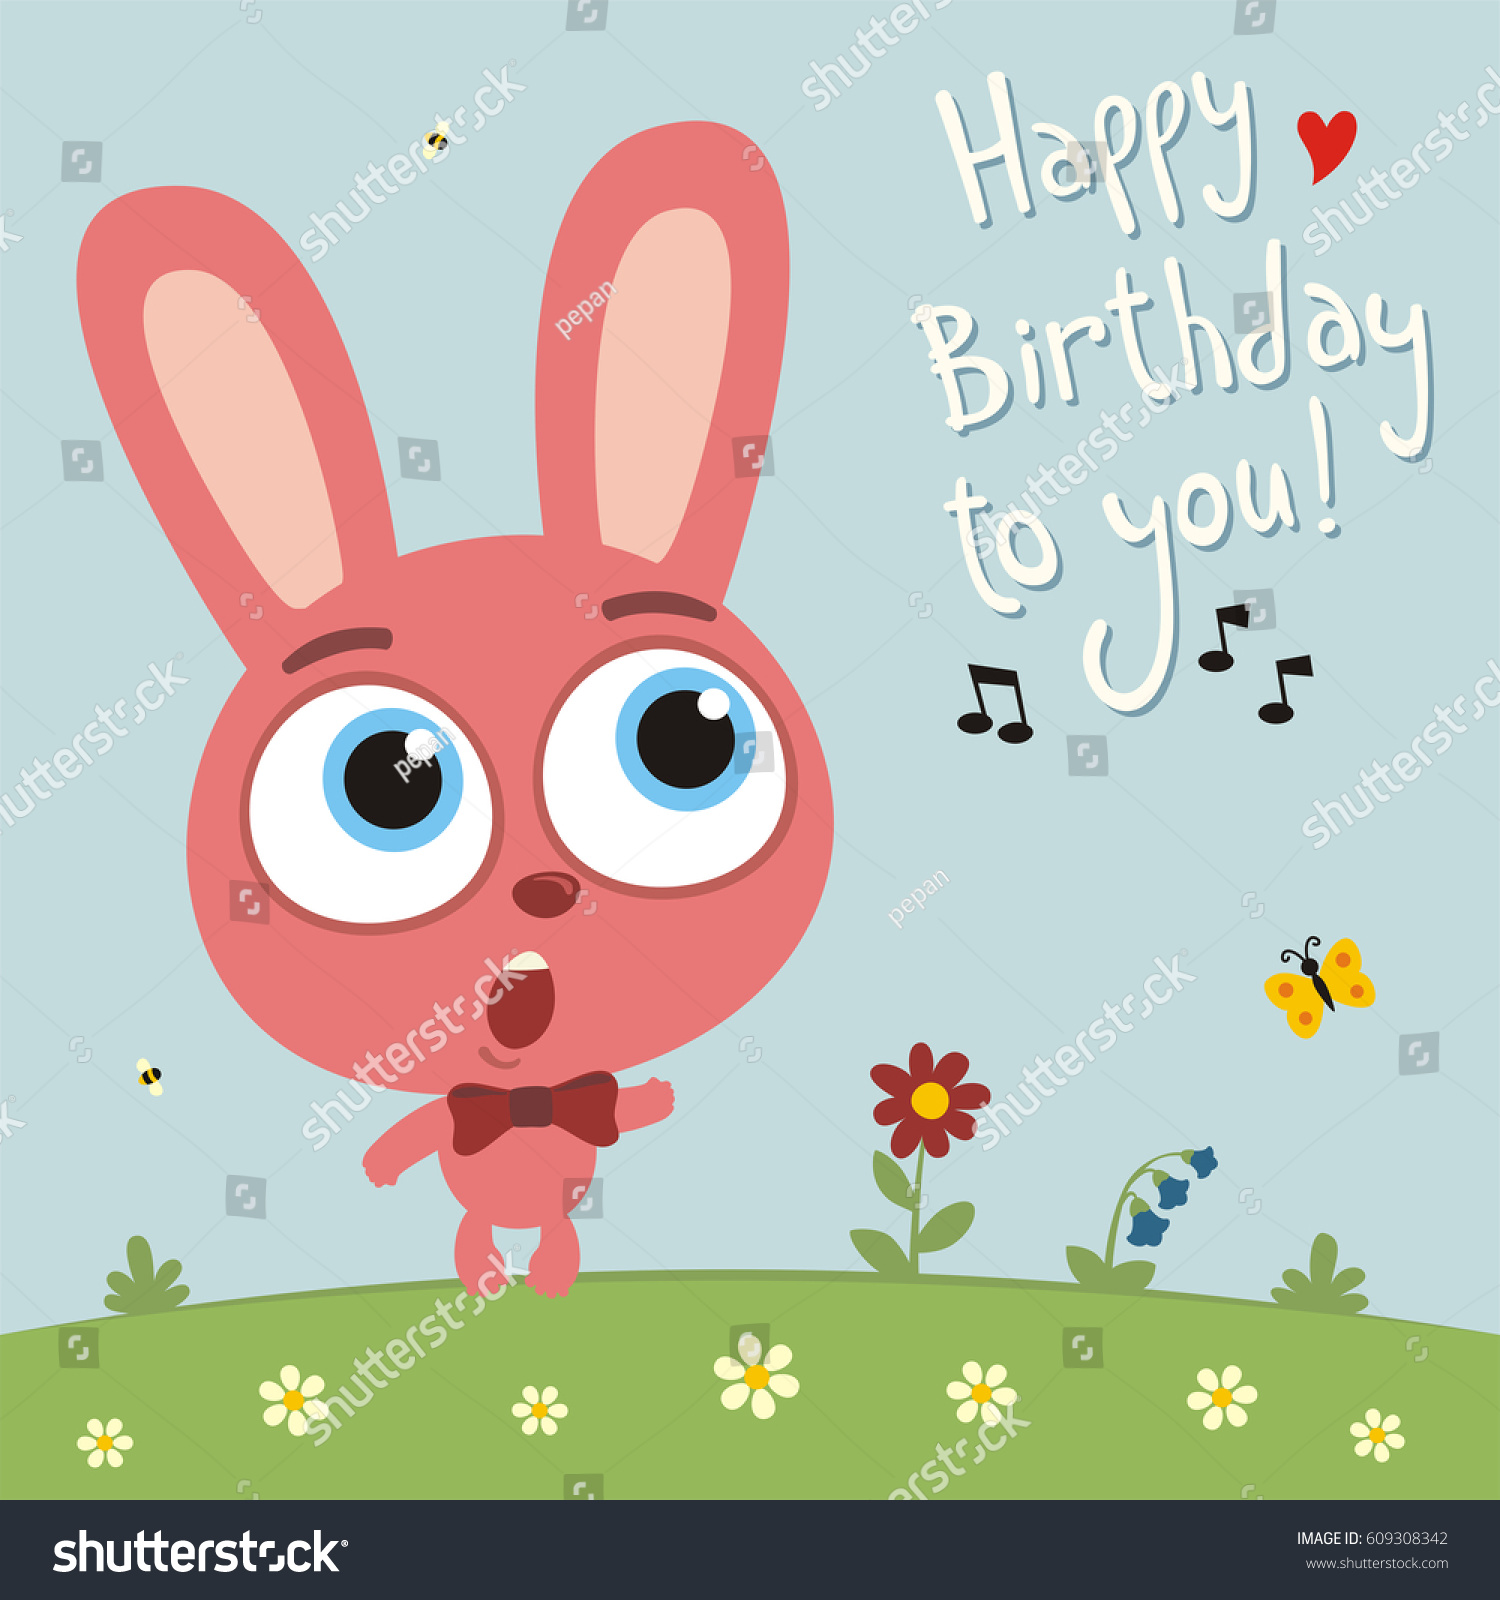 Happy Birthday You Funny Bunny Rabbit Vector 609308342 – Birthday Singing Card